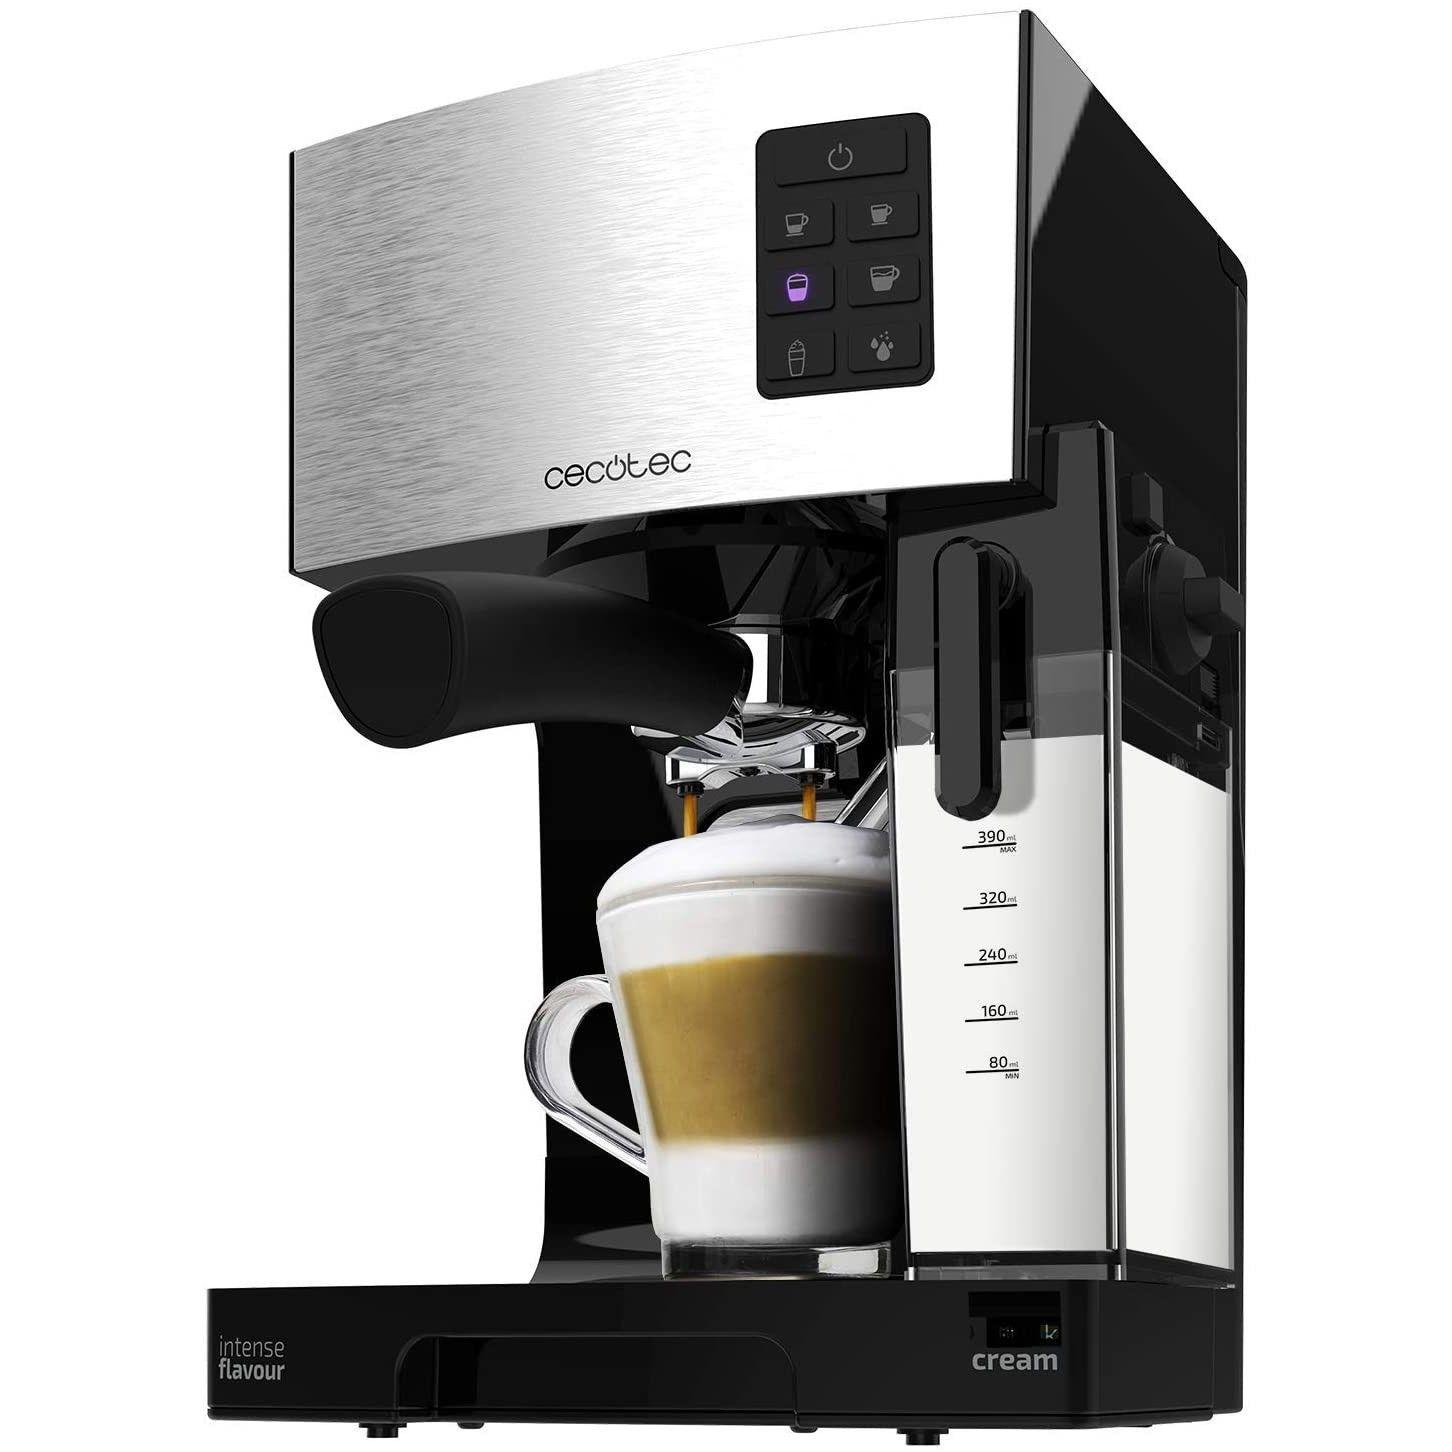 Espressor semi-automat Cecotec Power Instant-ccino 20, 1450 W, 20 bar, 1.4 l, rezervor lapte 400 ml